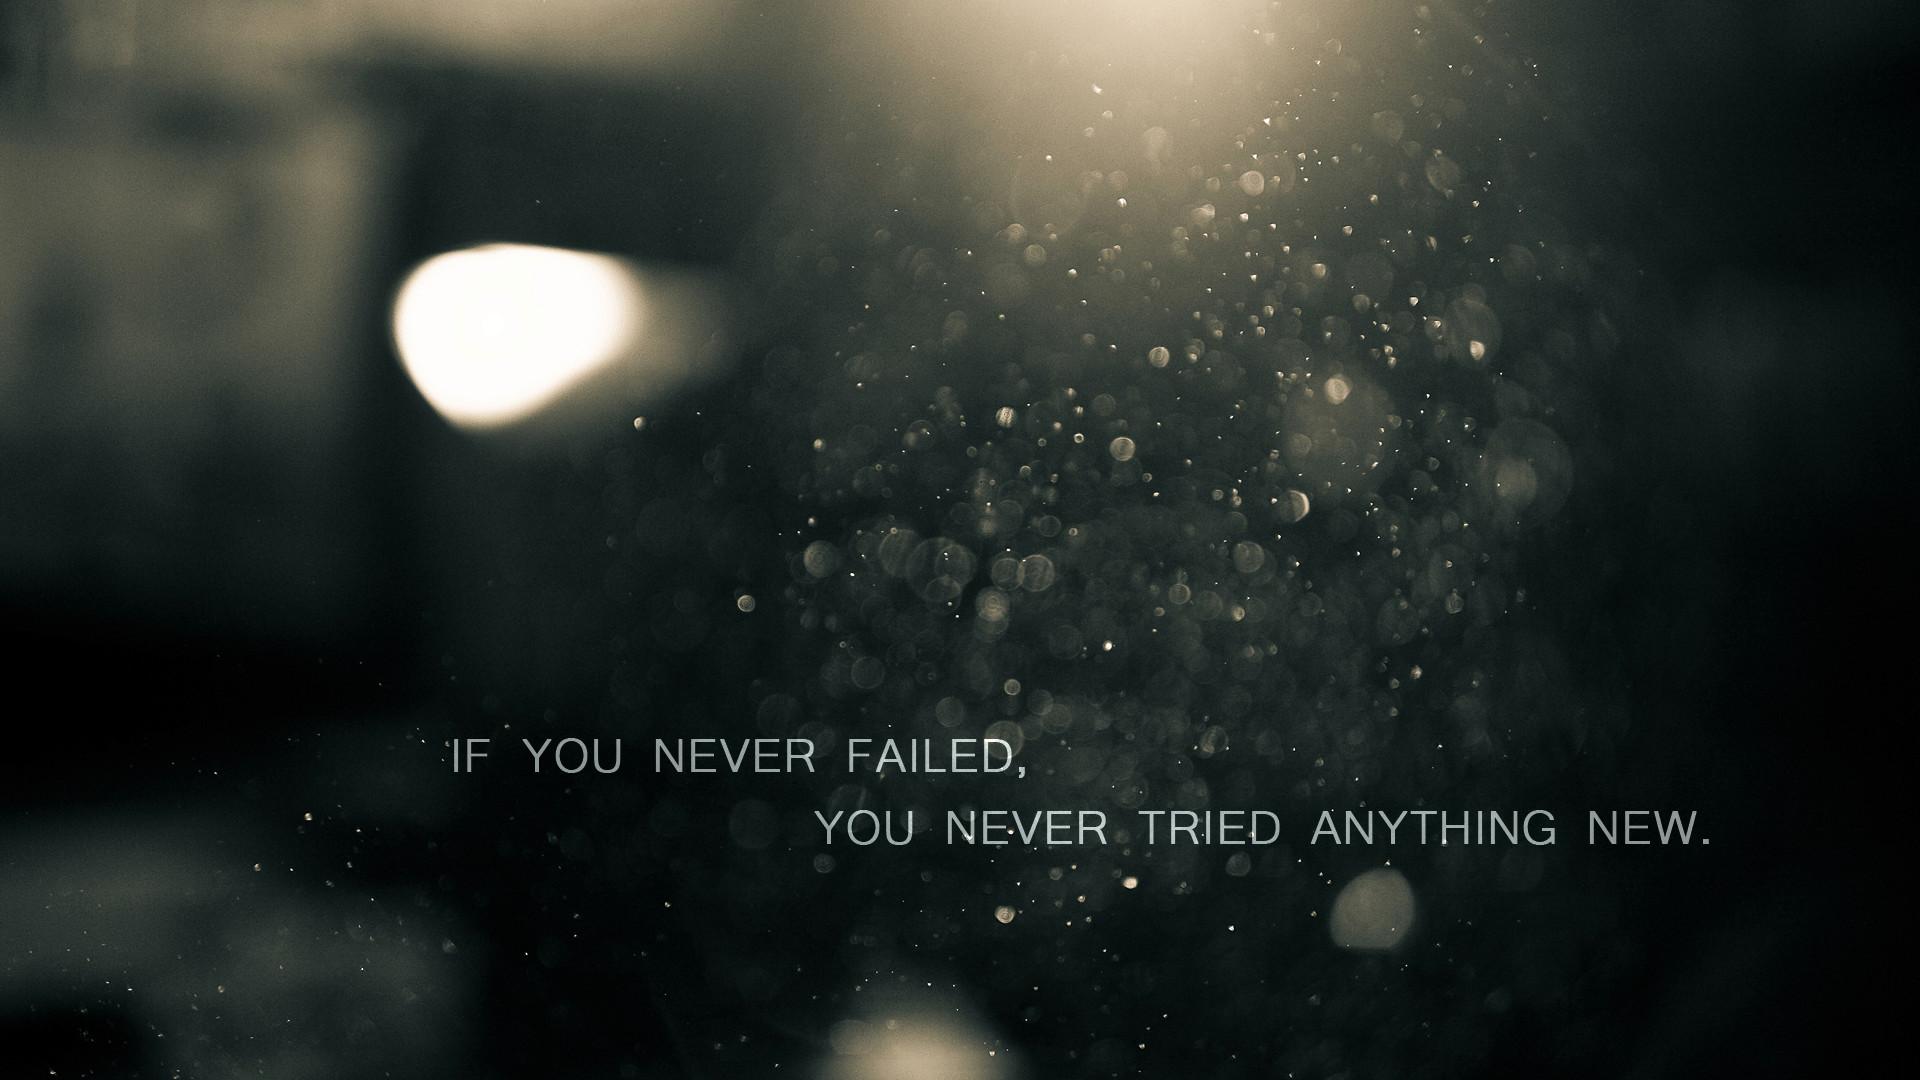 1920x1080 Motivational Quote Wallpaper 10